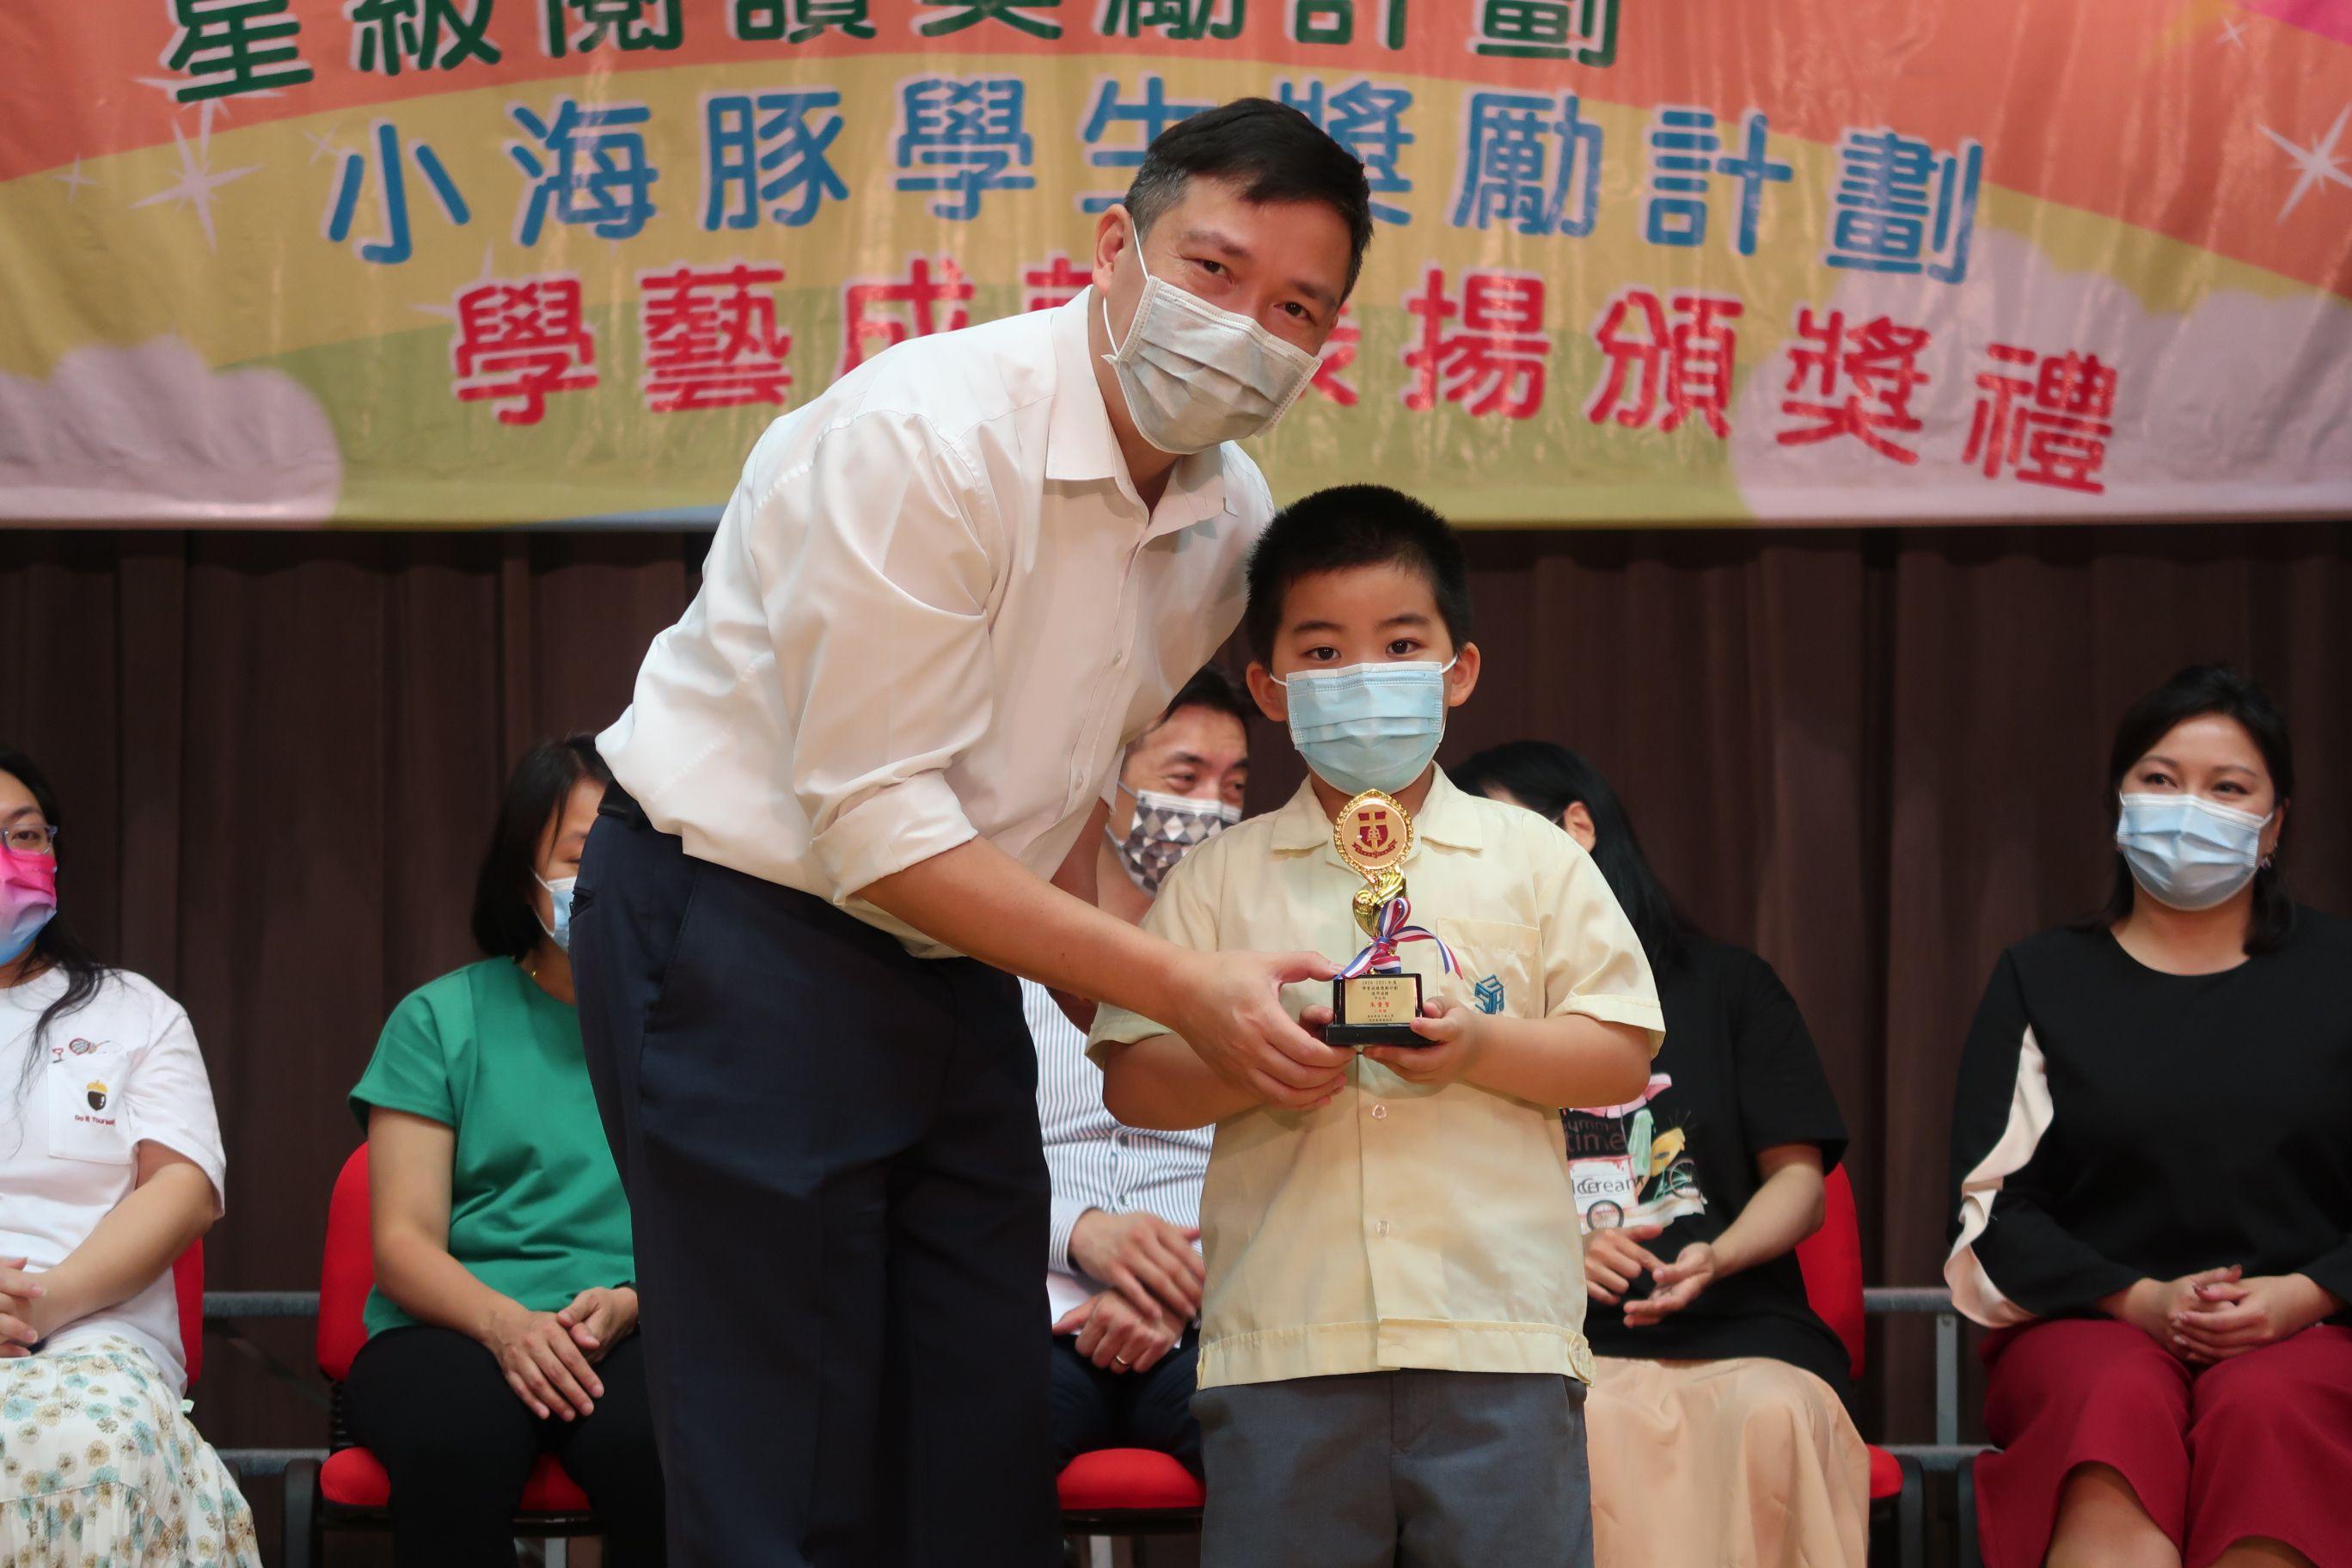 https://syh.edu.hk/sites/default/files/img_5645.jpg